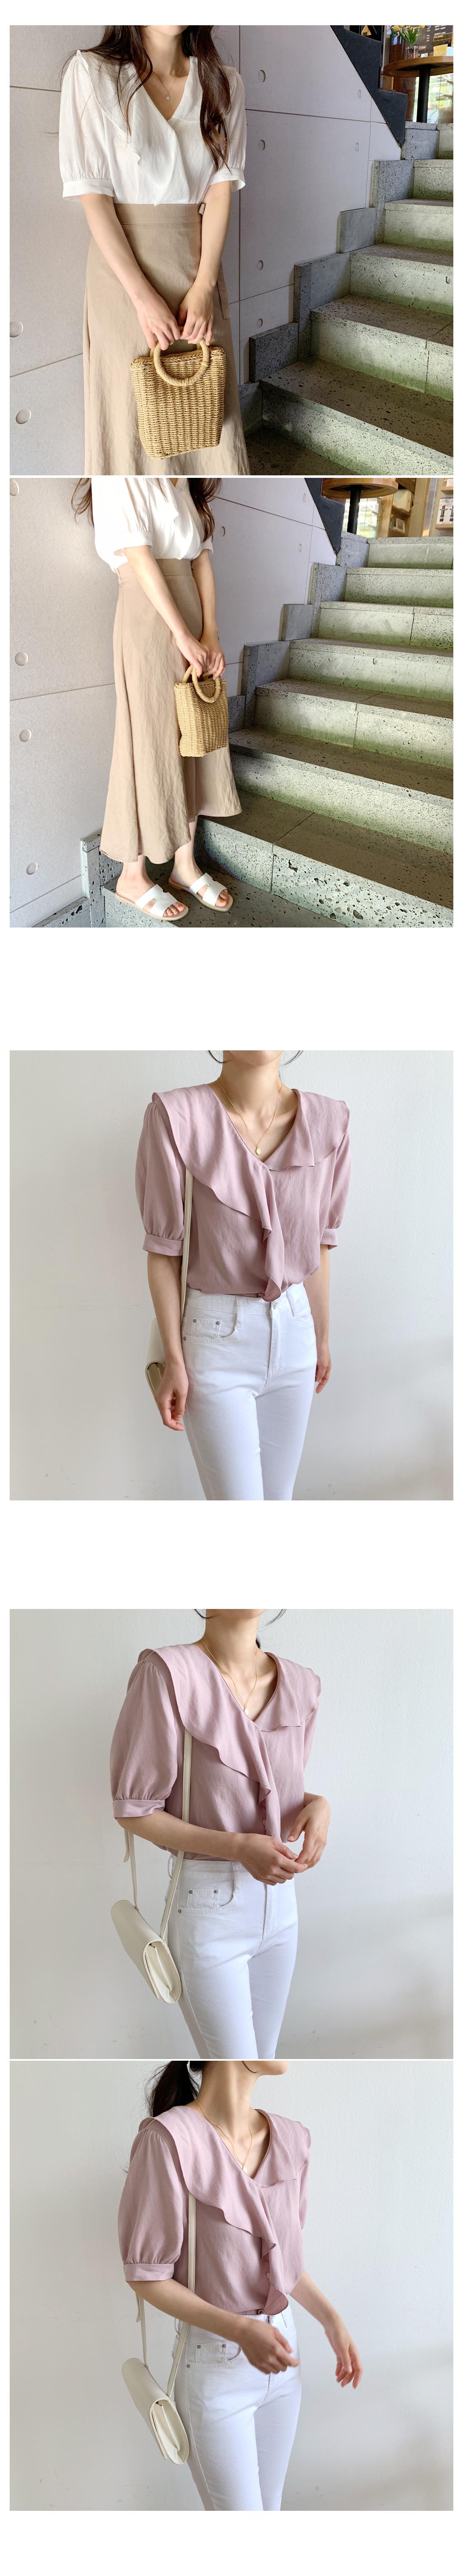 Chloe frilly blouse